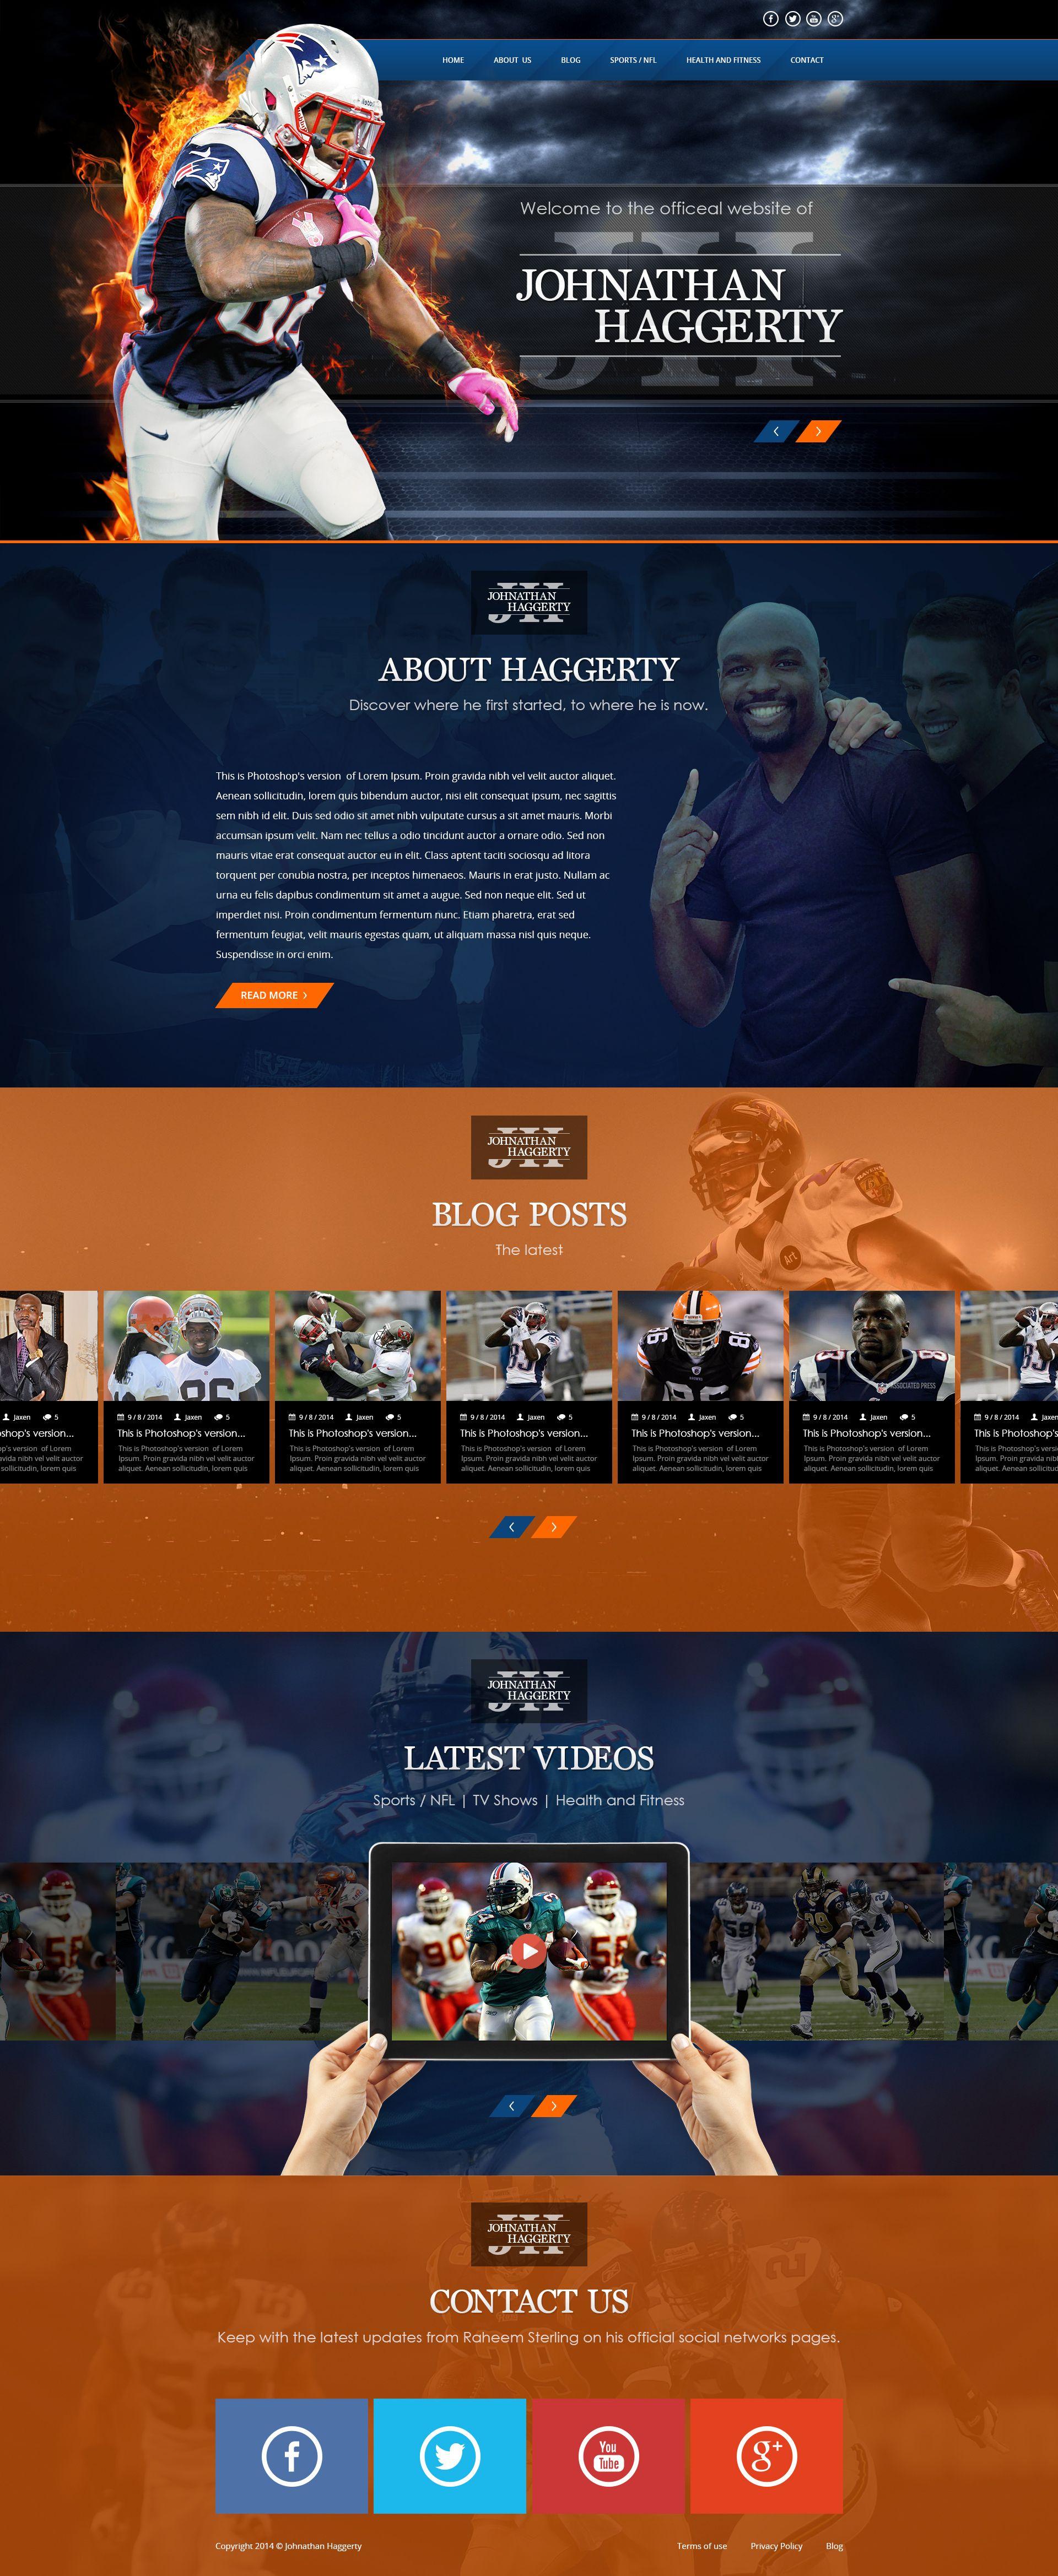 professional athlete website